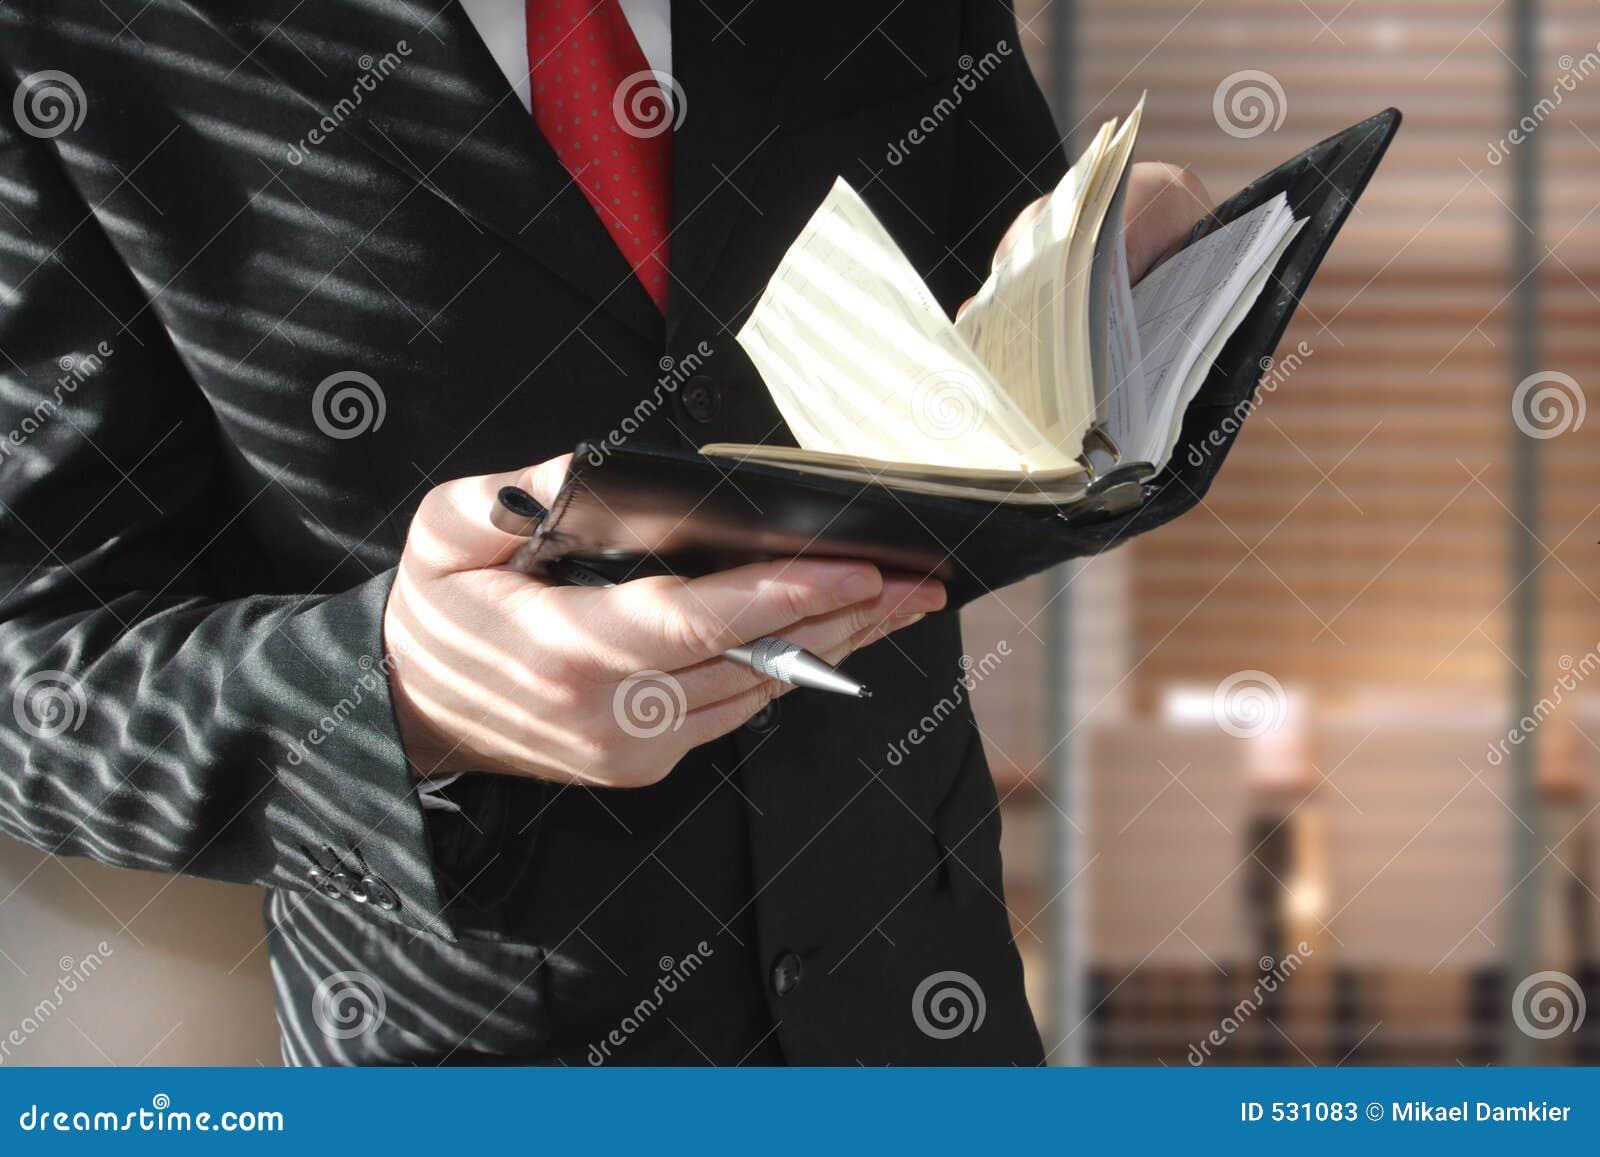 Download 生意人 库存图片. 图片 包括有 人们, 增长, 眼镜, 生意人, 白种人, 空白, 日志, filofax - 531083